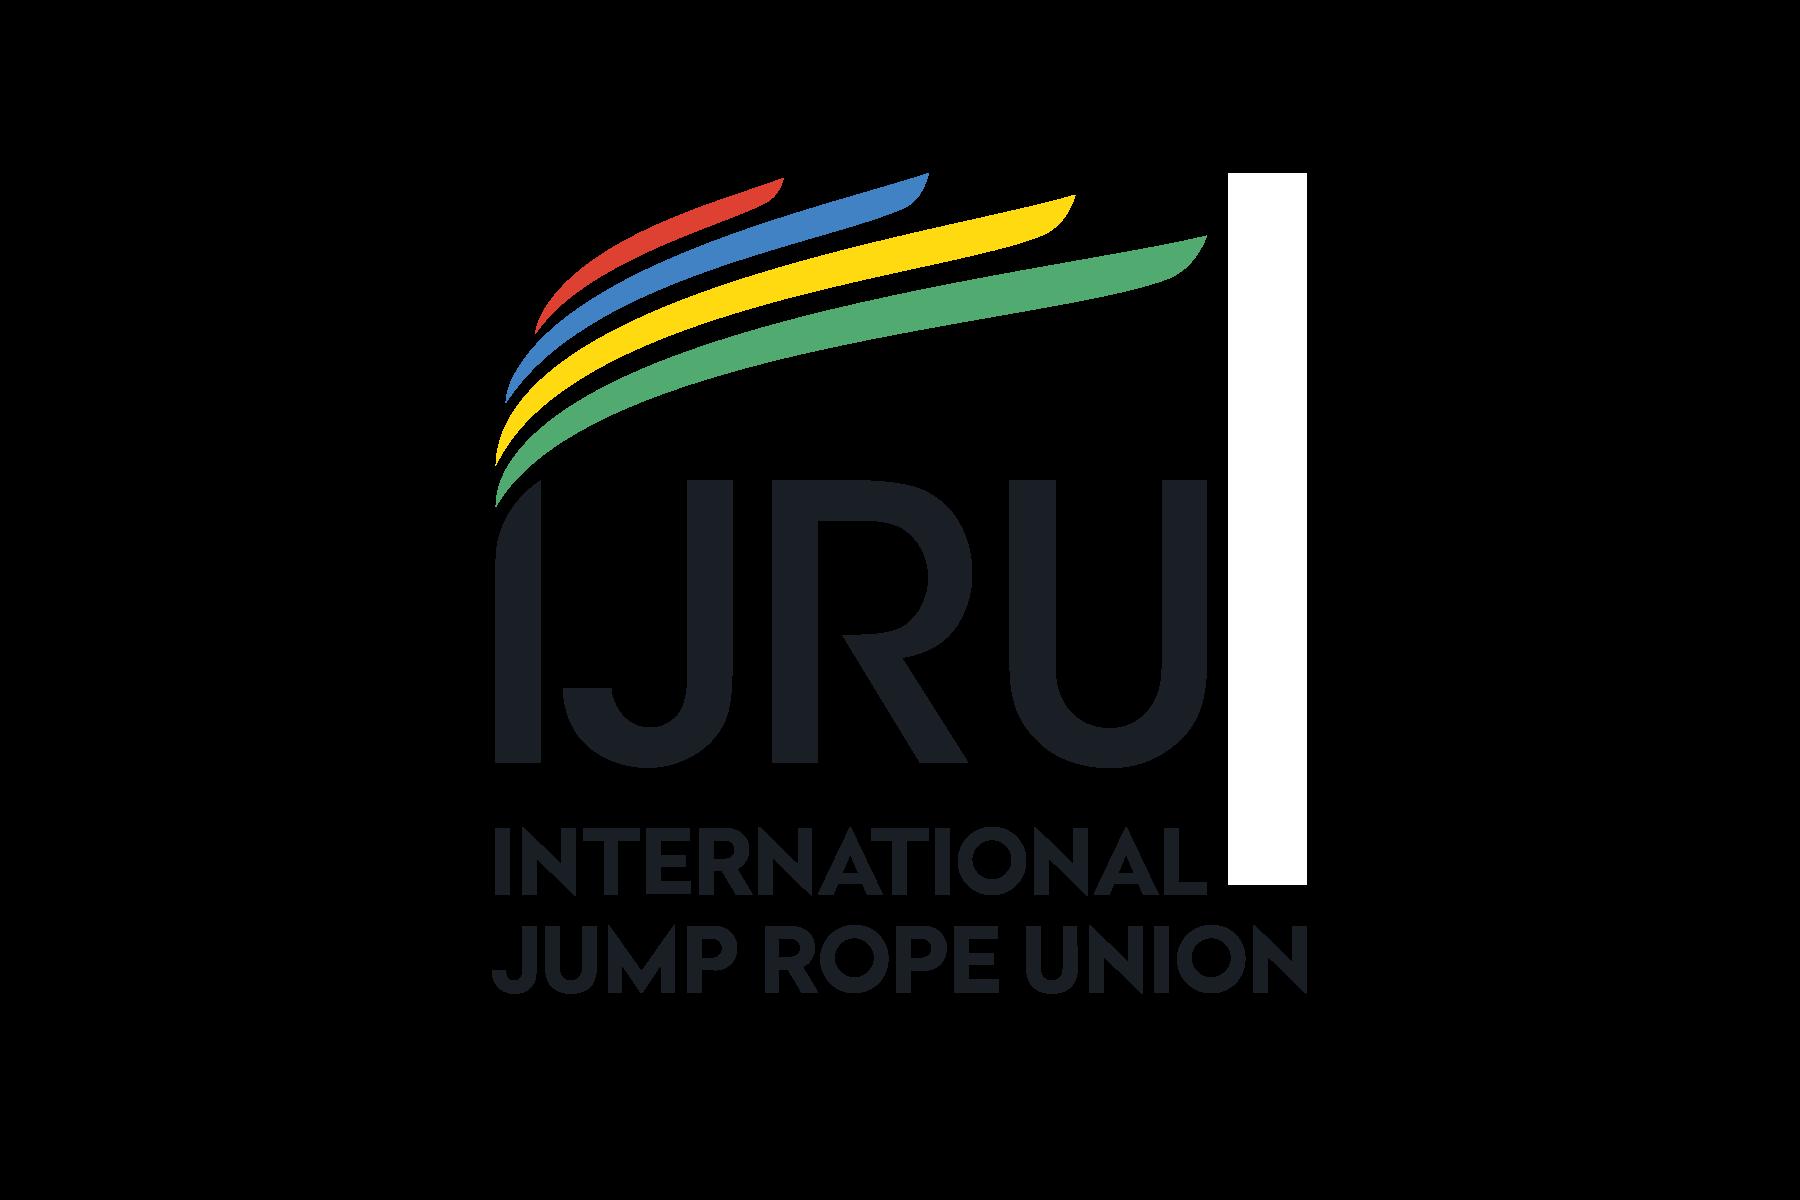 International Jump Rope Union